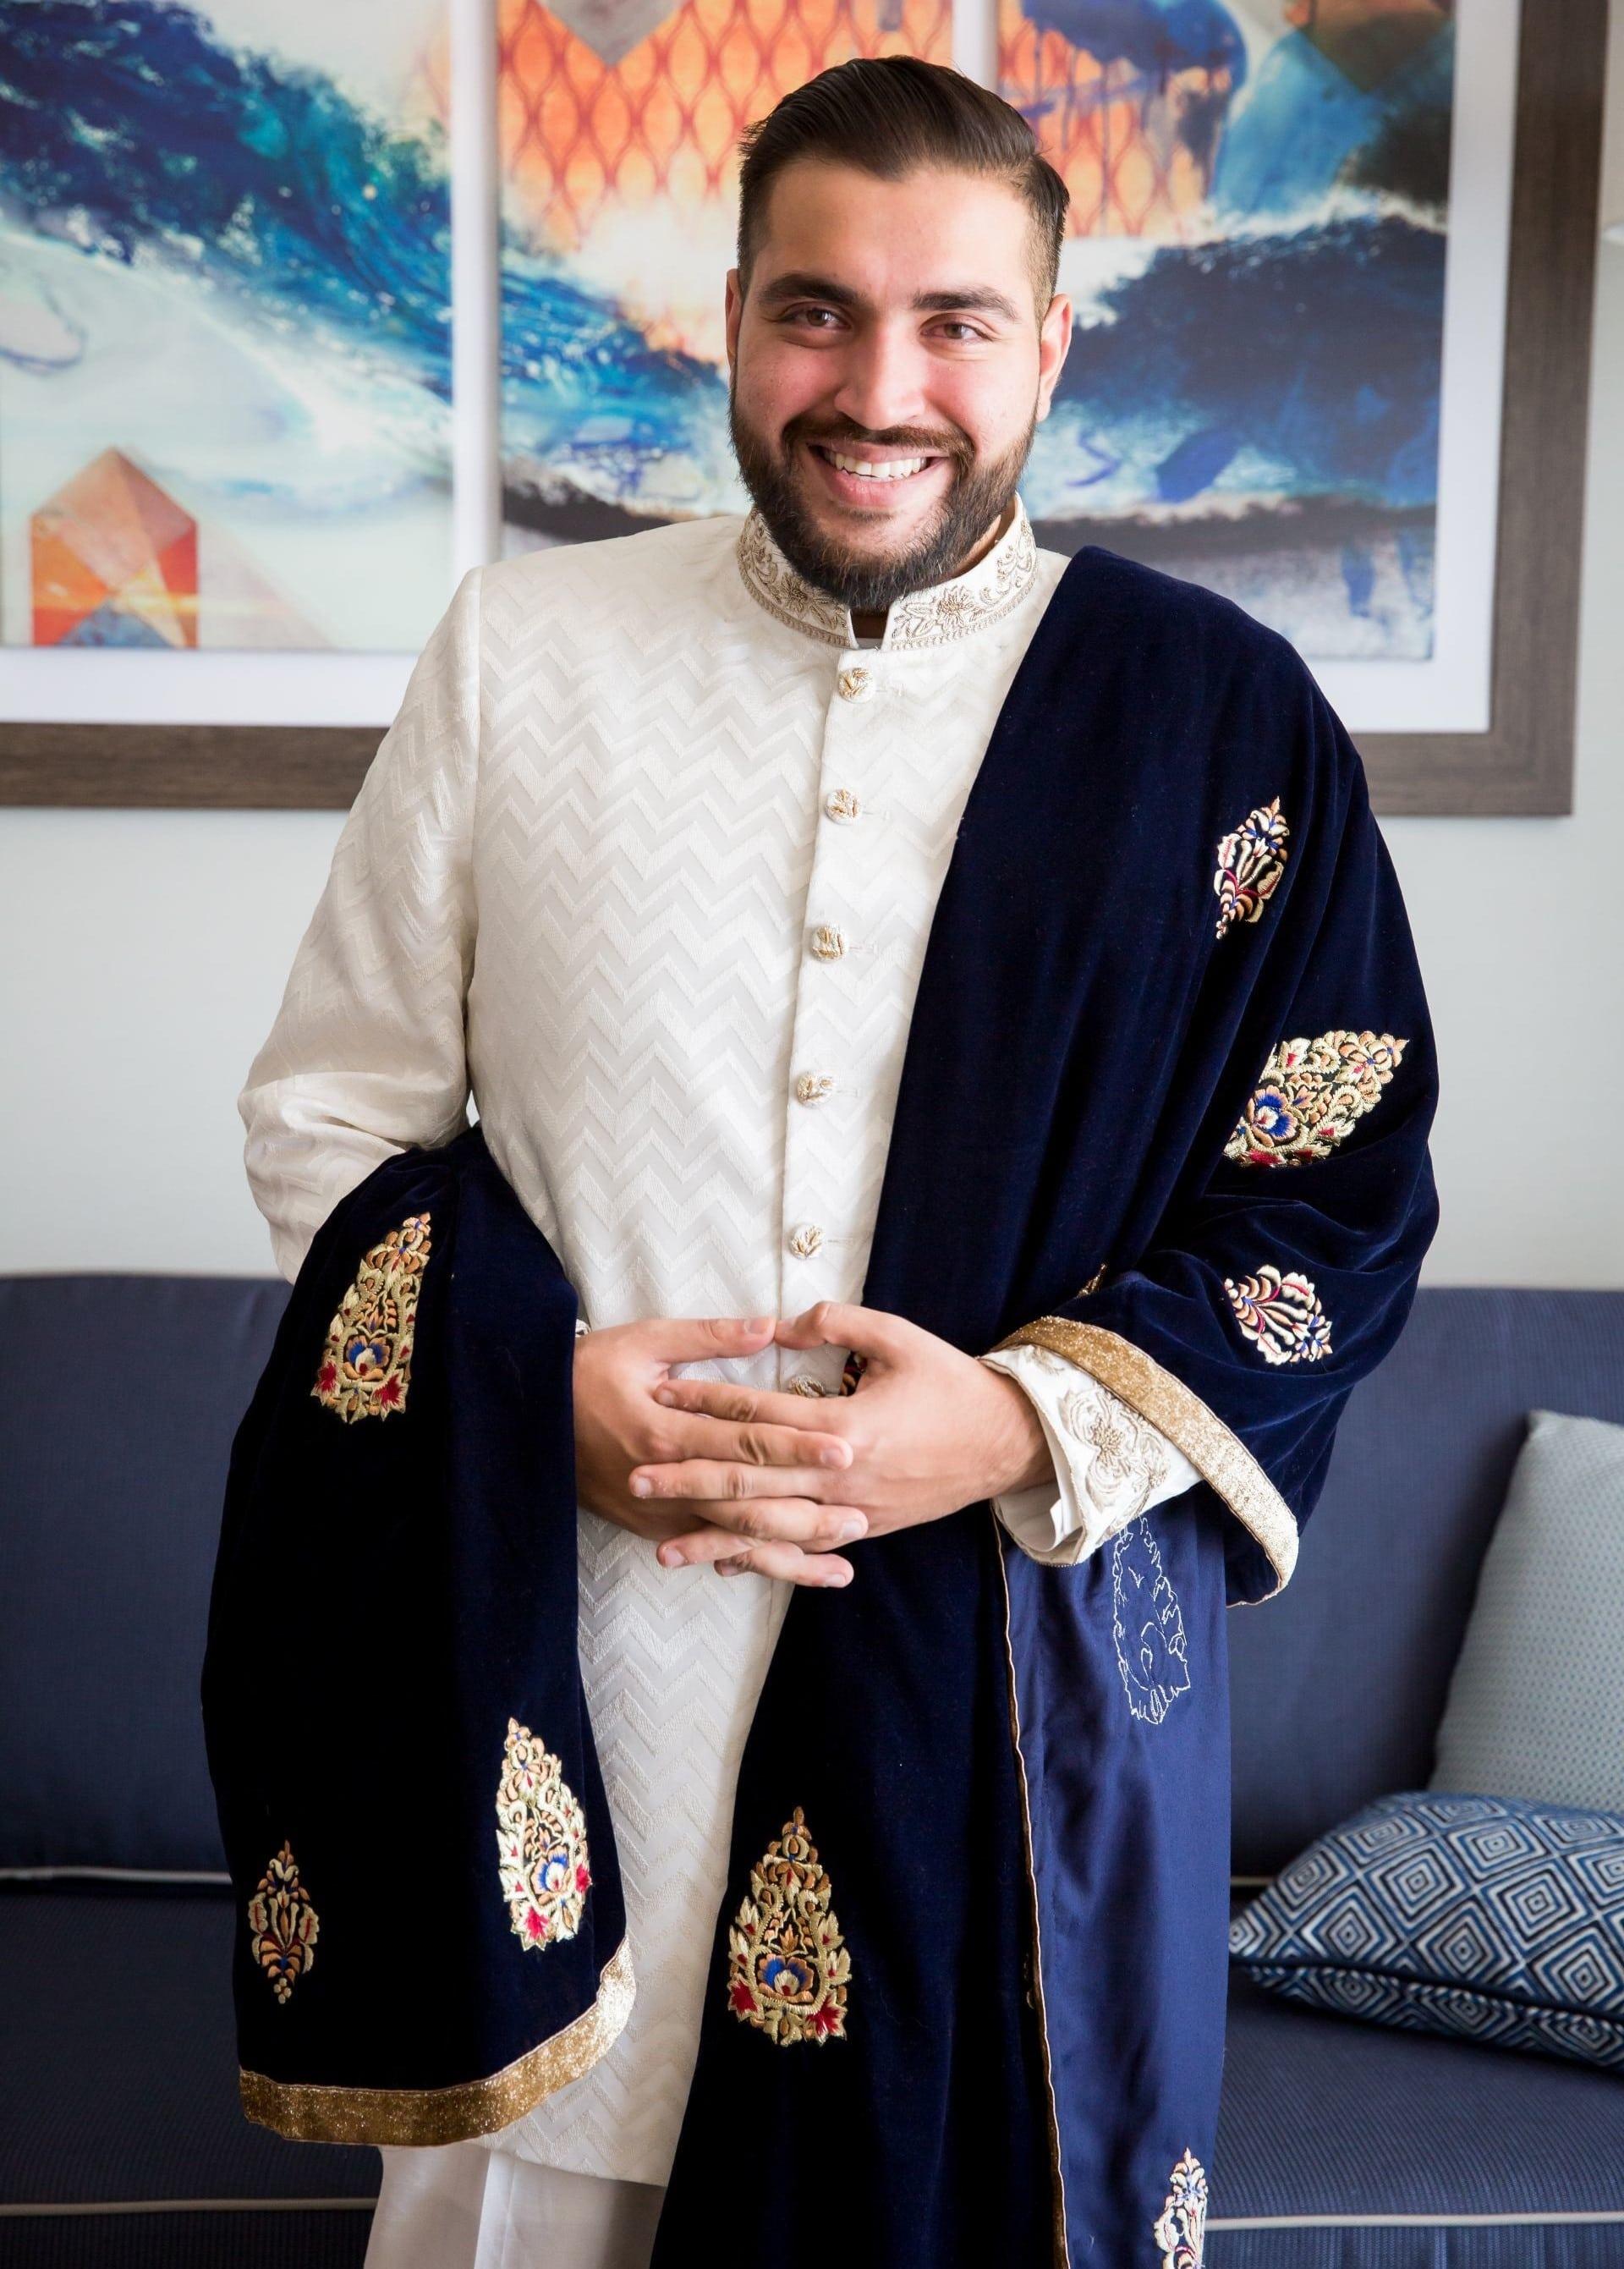 Indian groom wearing sherwani with black stole